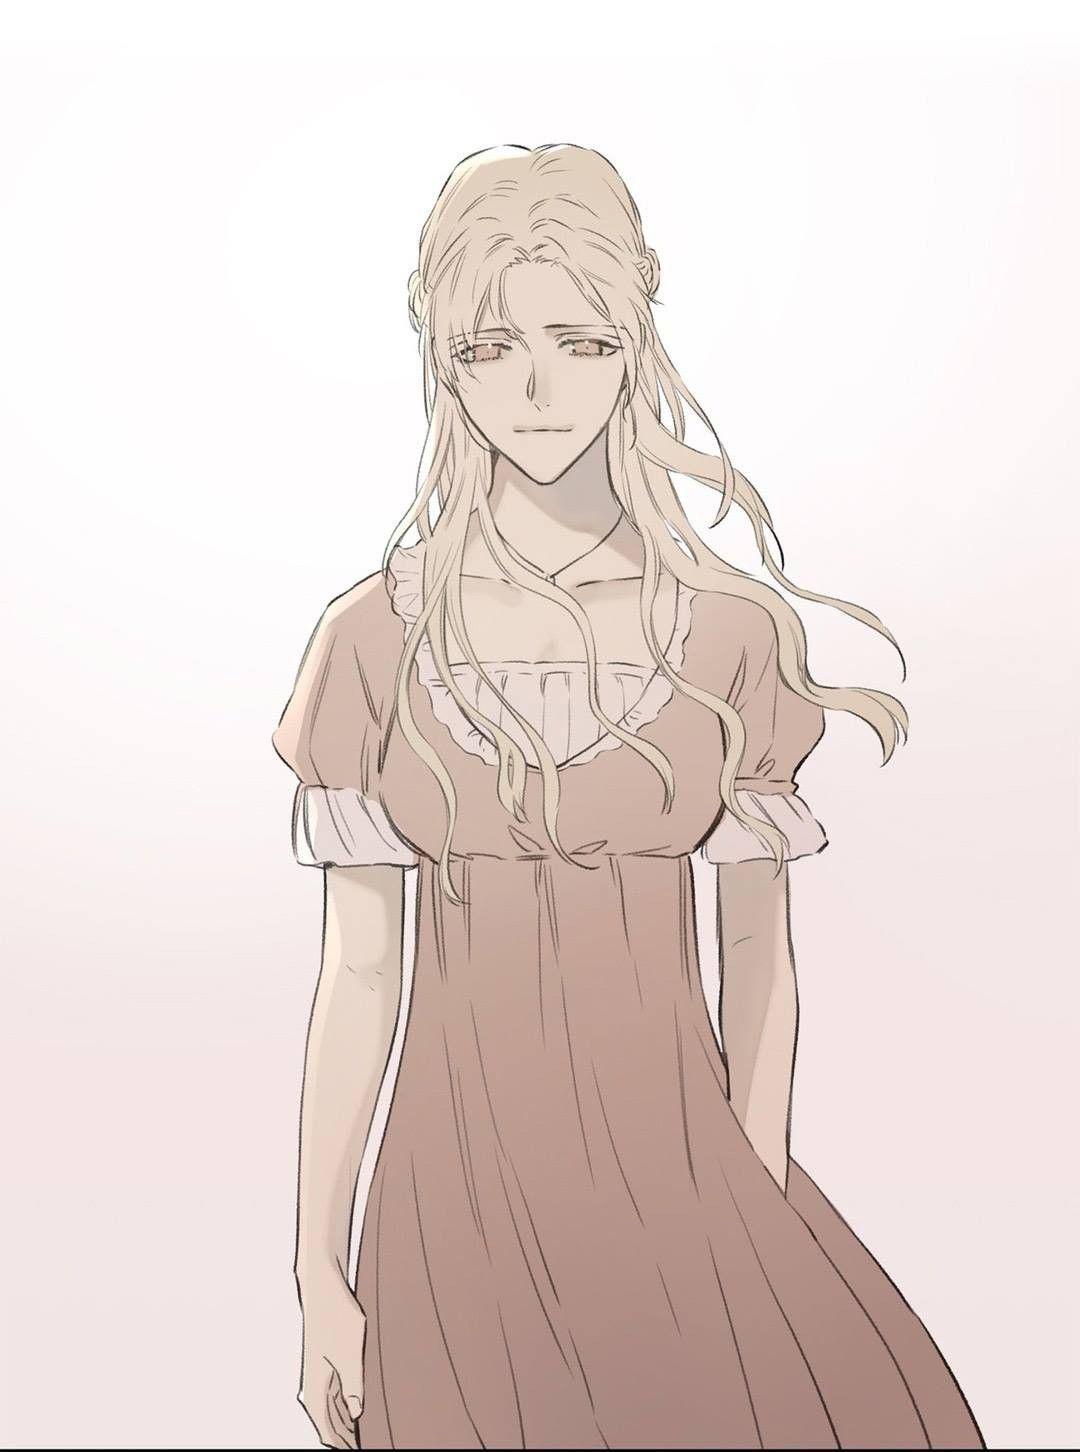 Pin By K L A U S On Lezhin Comics Princess Zelda Fictional